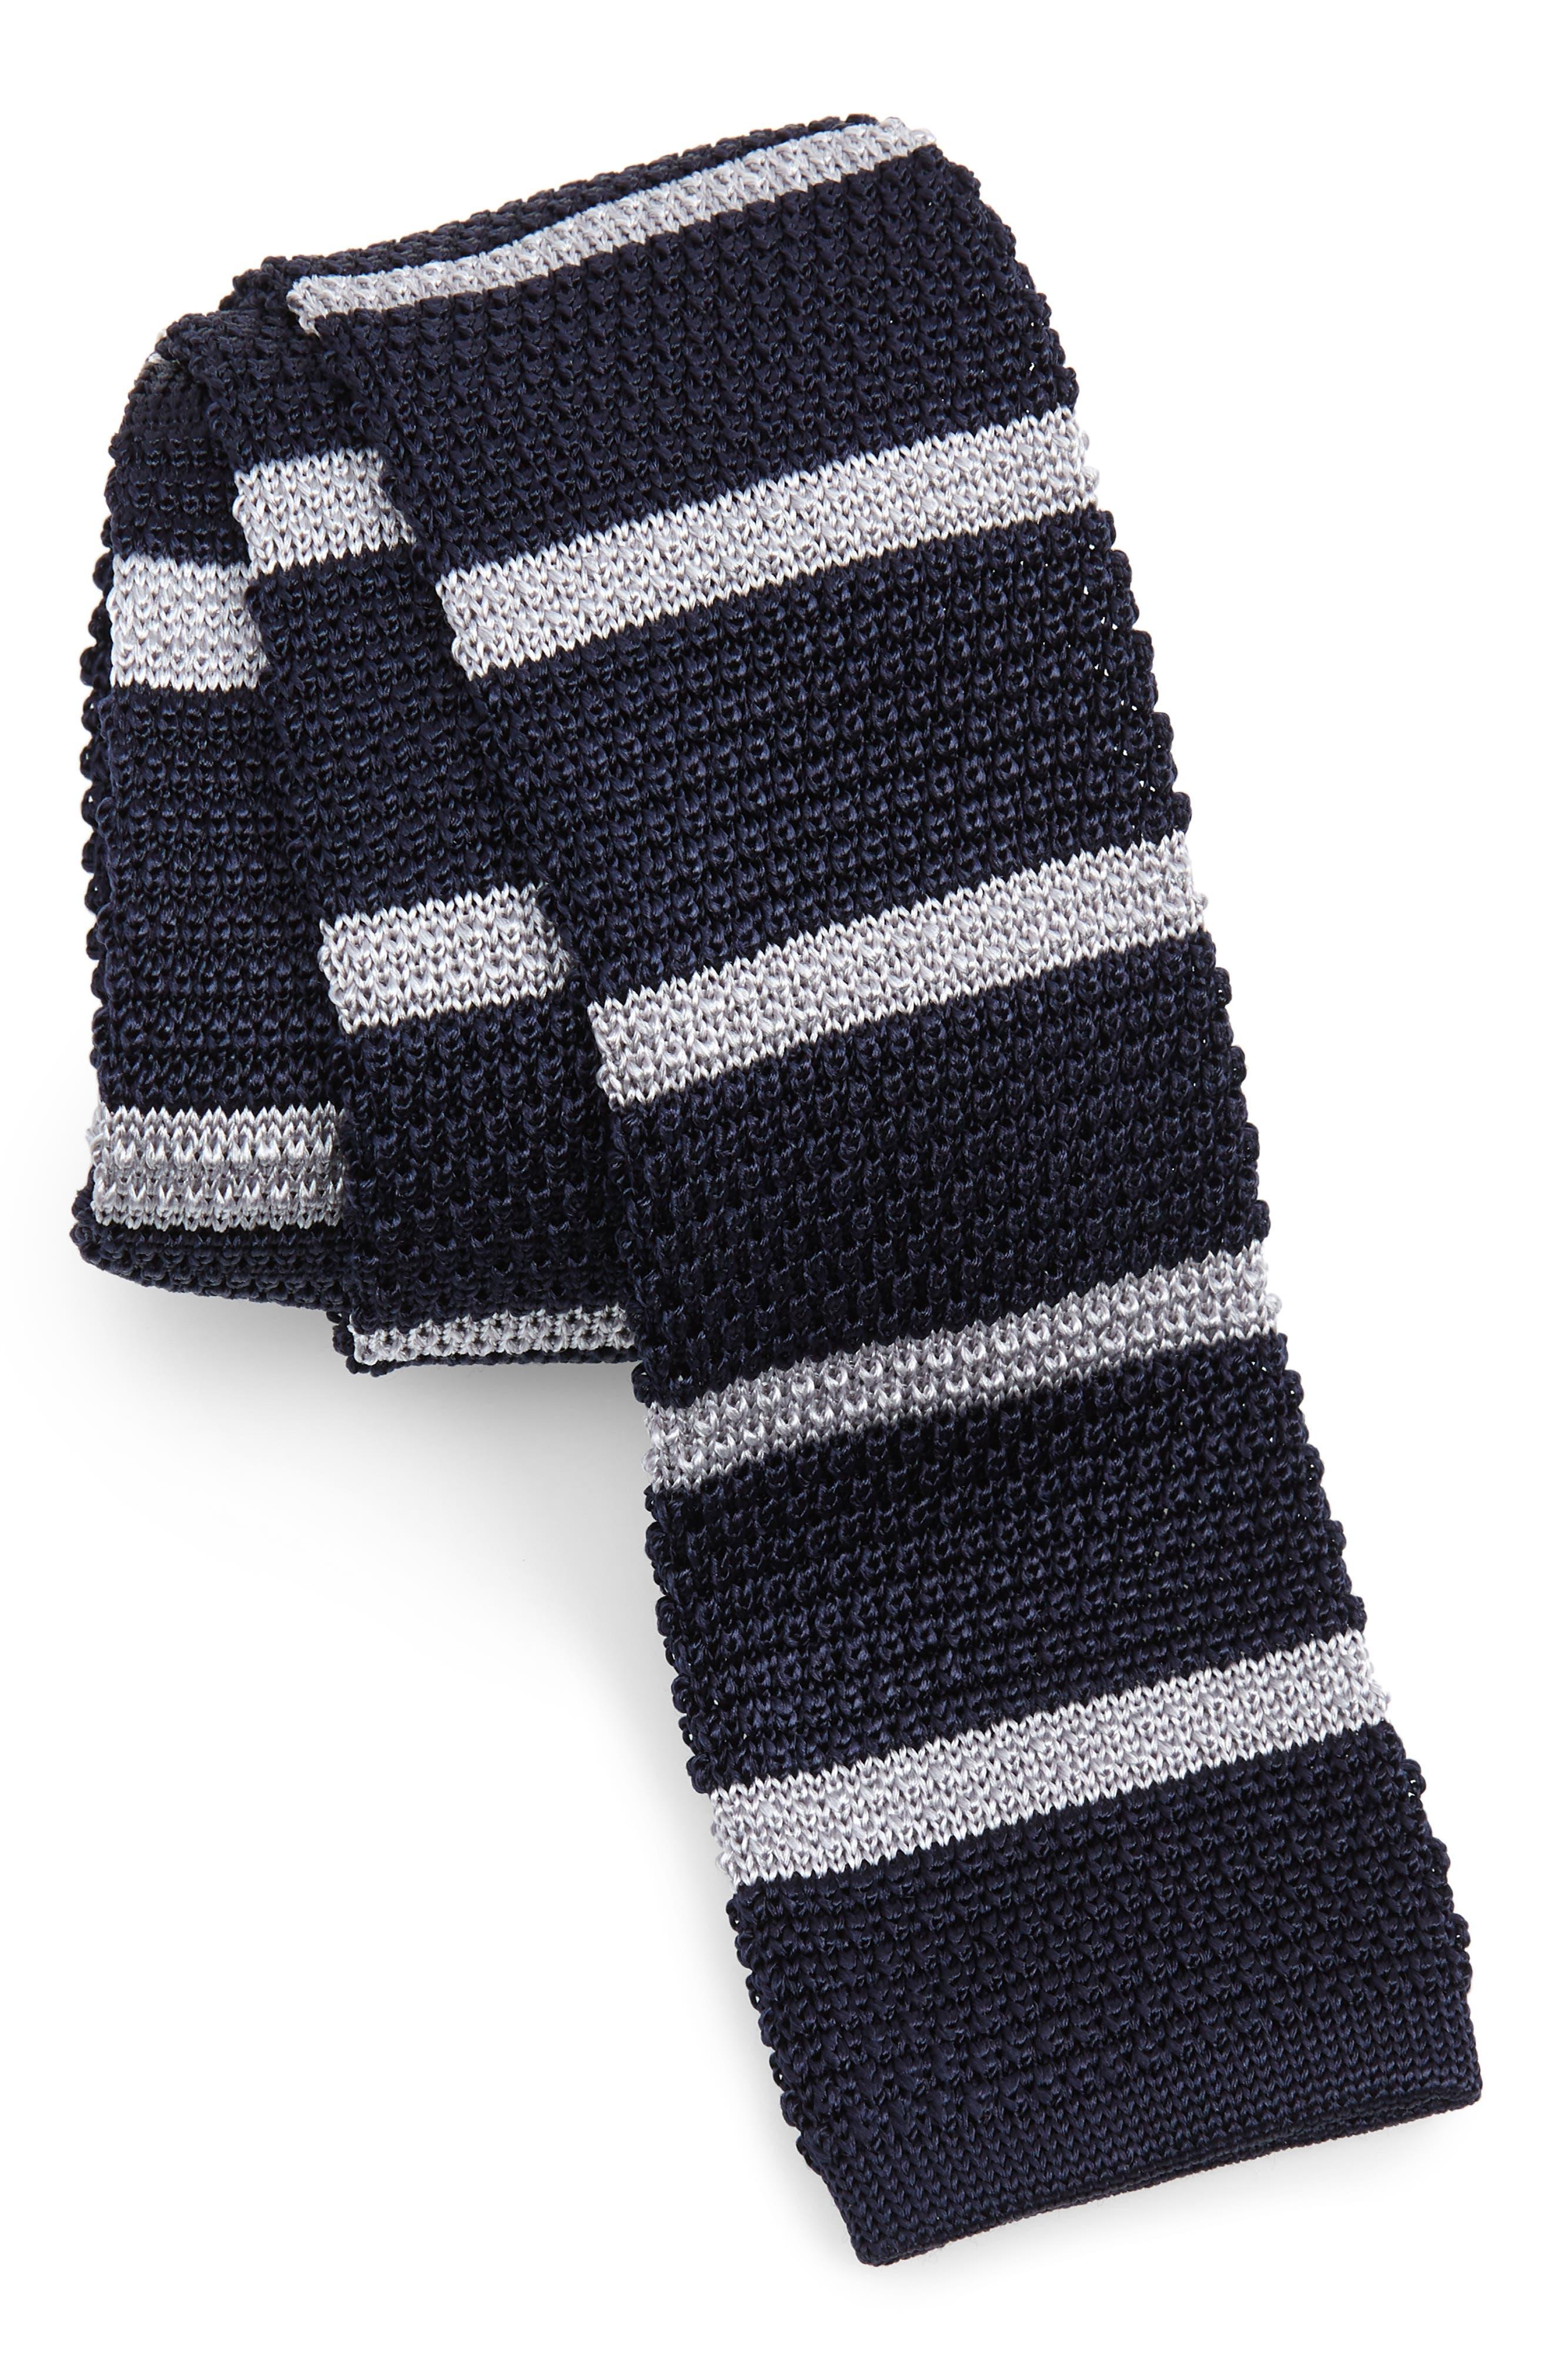 1920s Bow Ties | Gatsby Tie,  Art Deco Tie Mens Boss Stripe Knit Silk Tie $78.98 AT vintagedancer.com